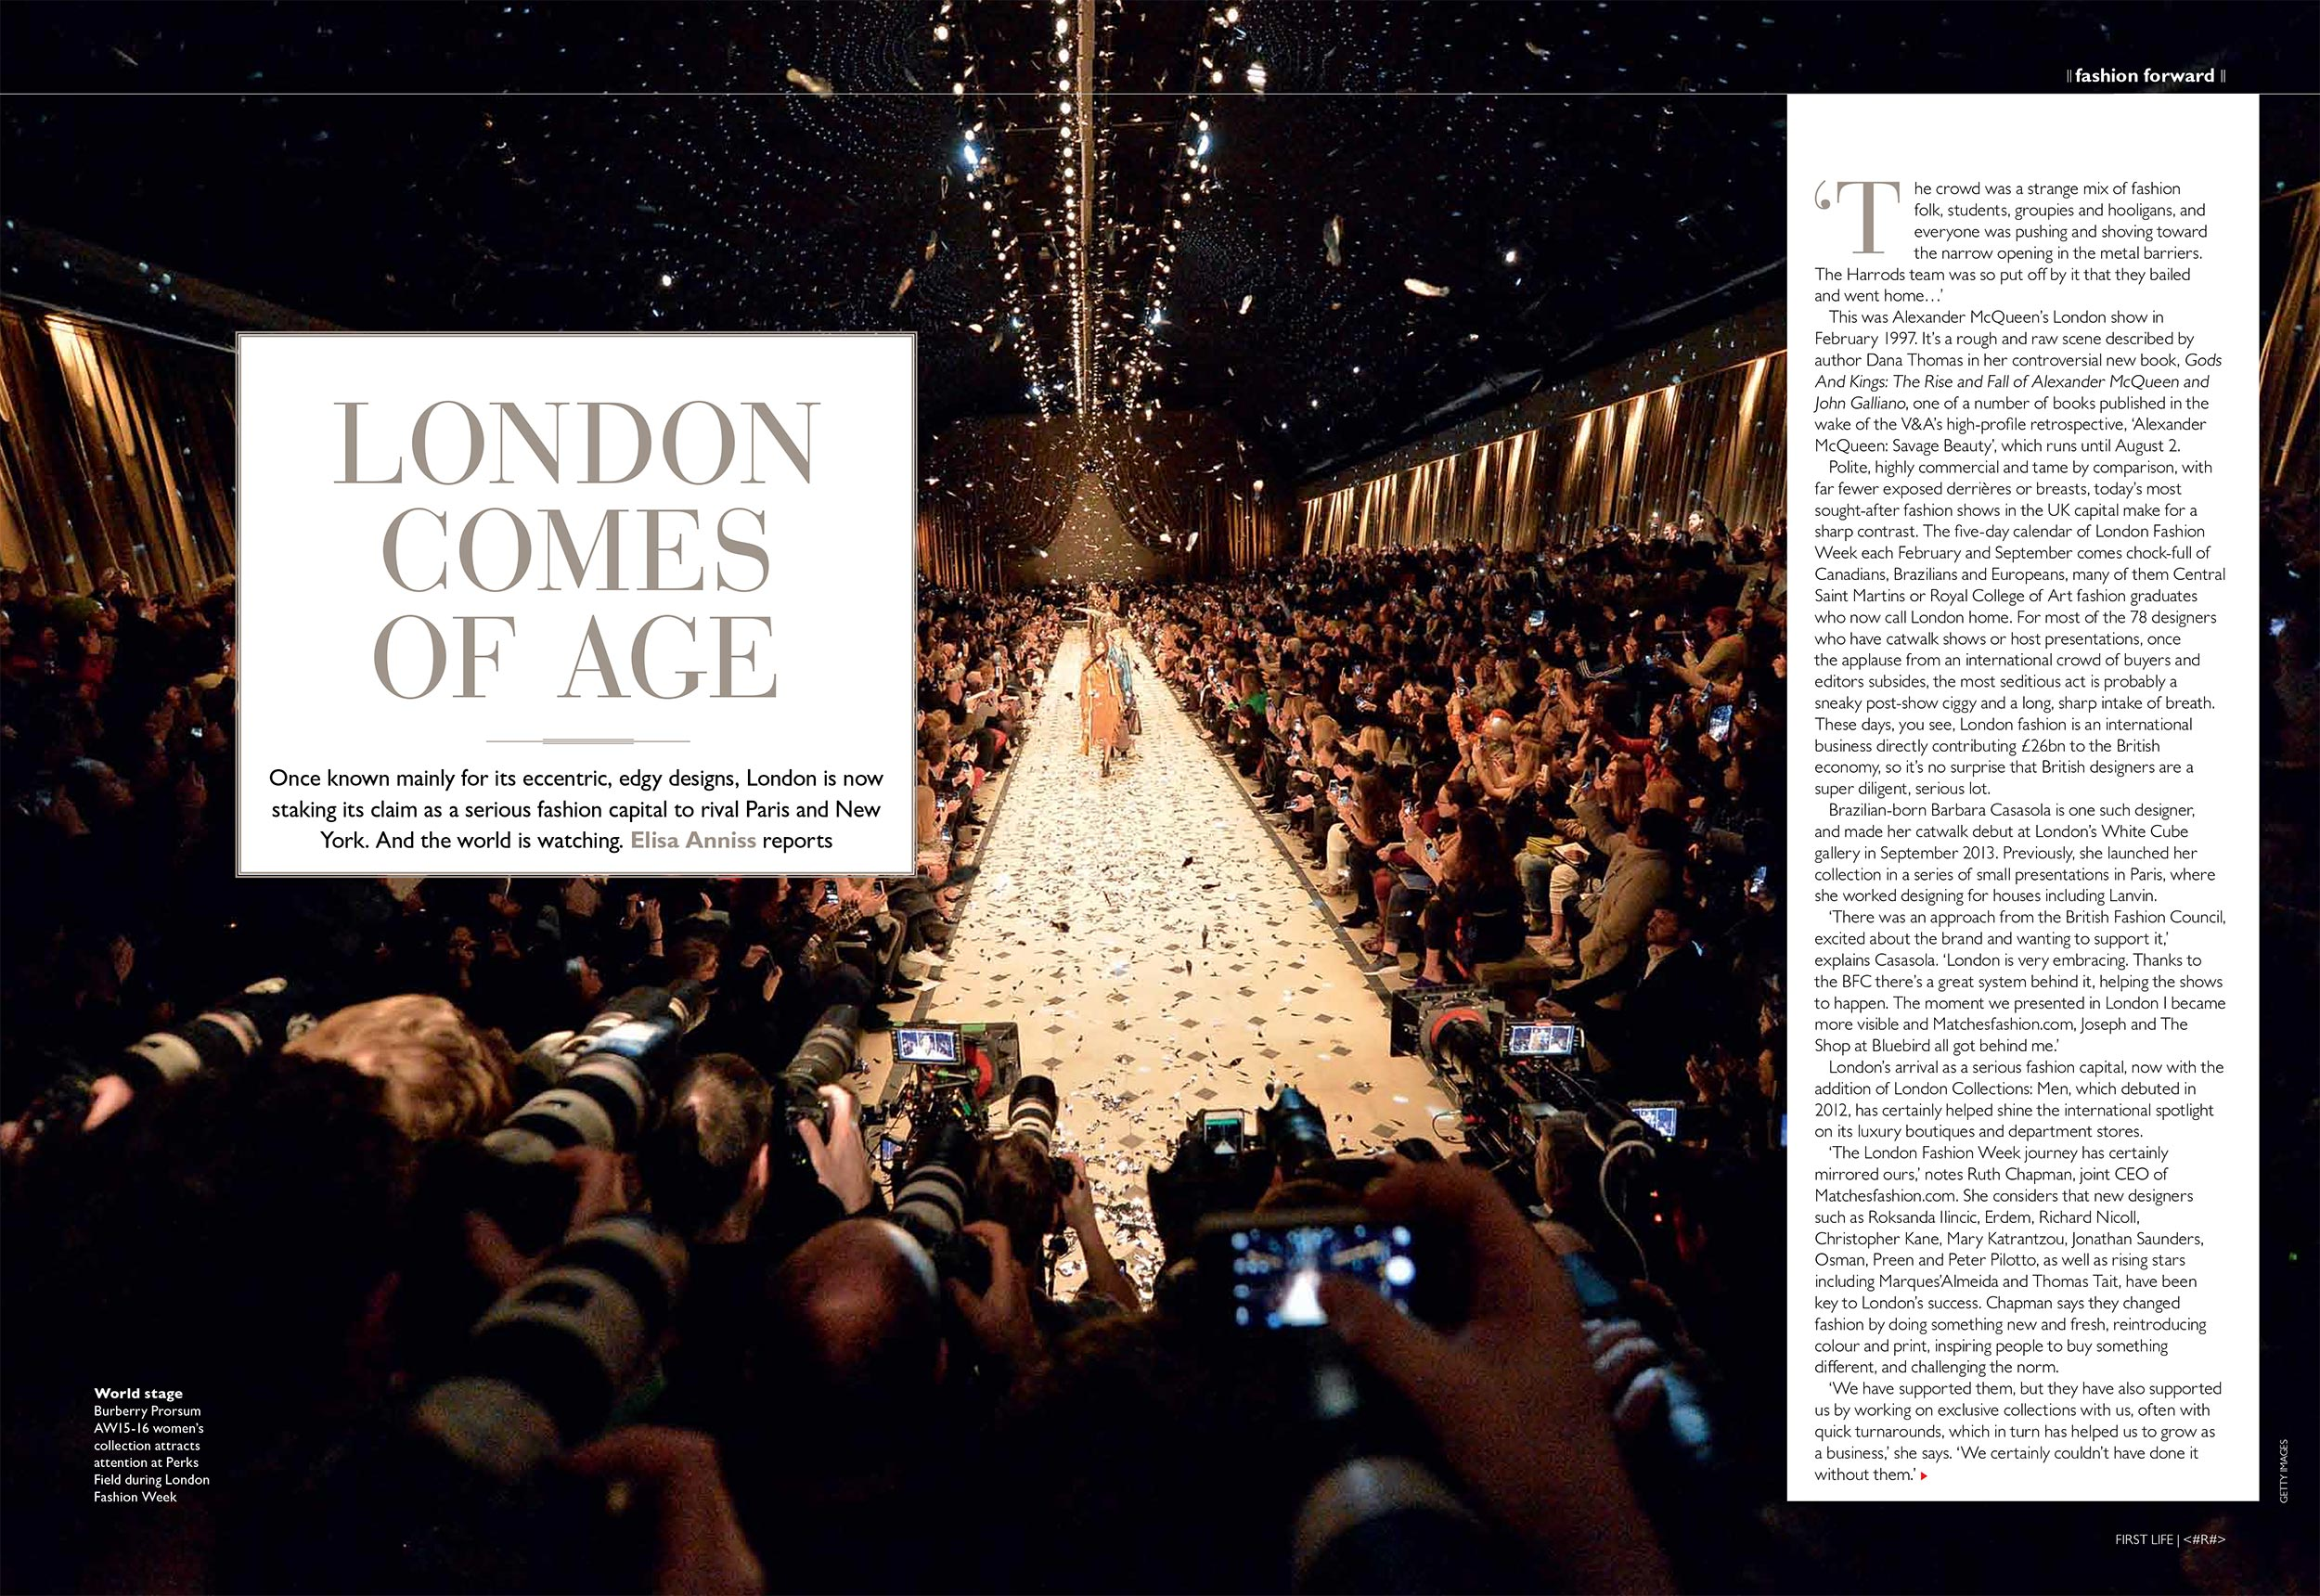 BA-First-Life-London-Fashion-1.jpg